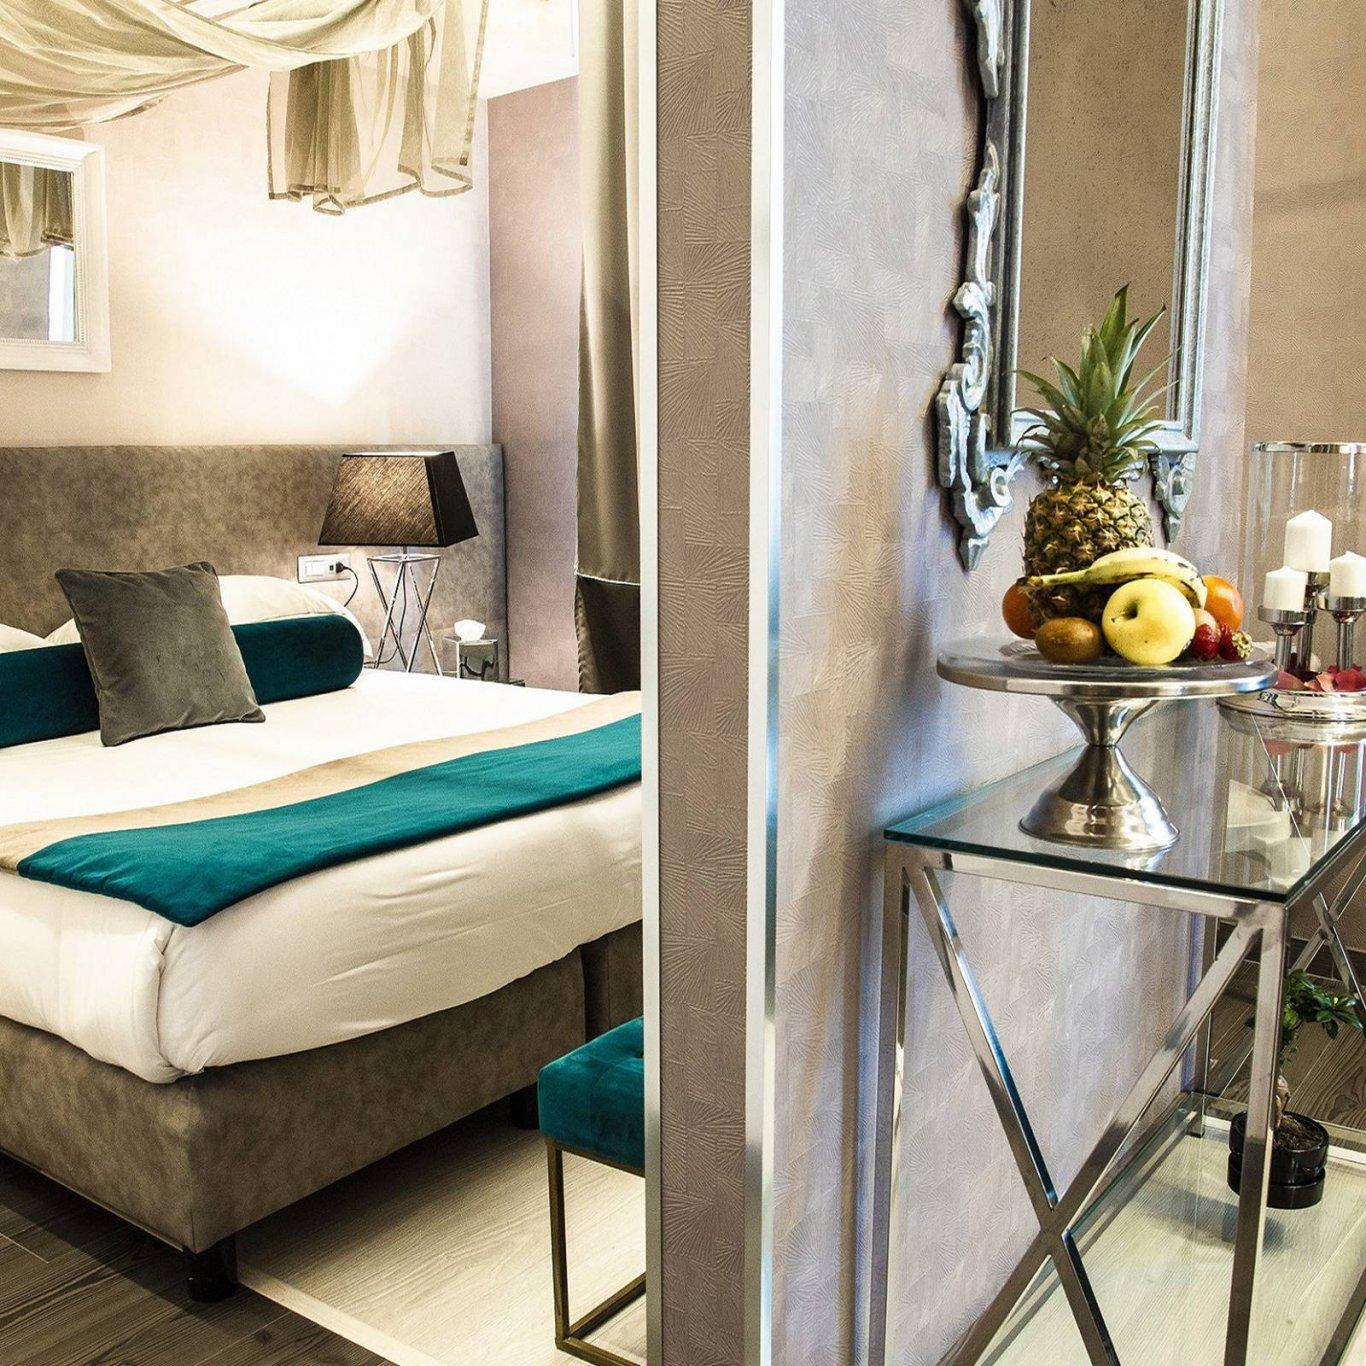 Dharma-luxury-hotel-wllness-suite-new-5-1